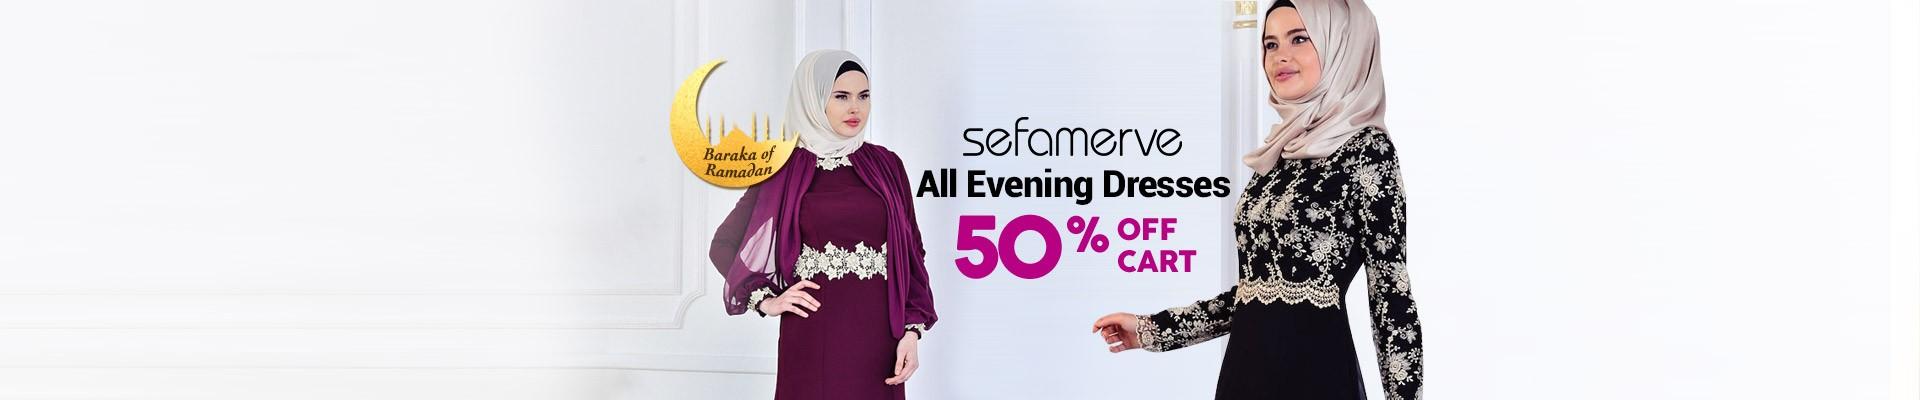 All Evening Dresses %50 off cart